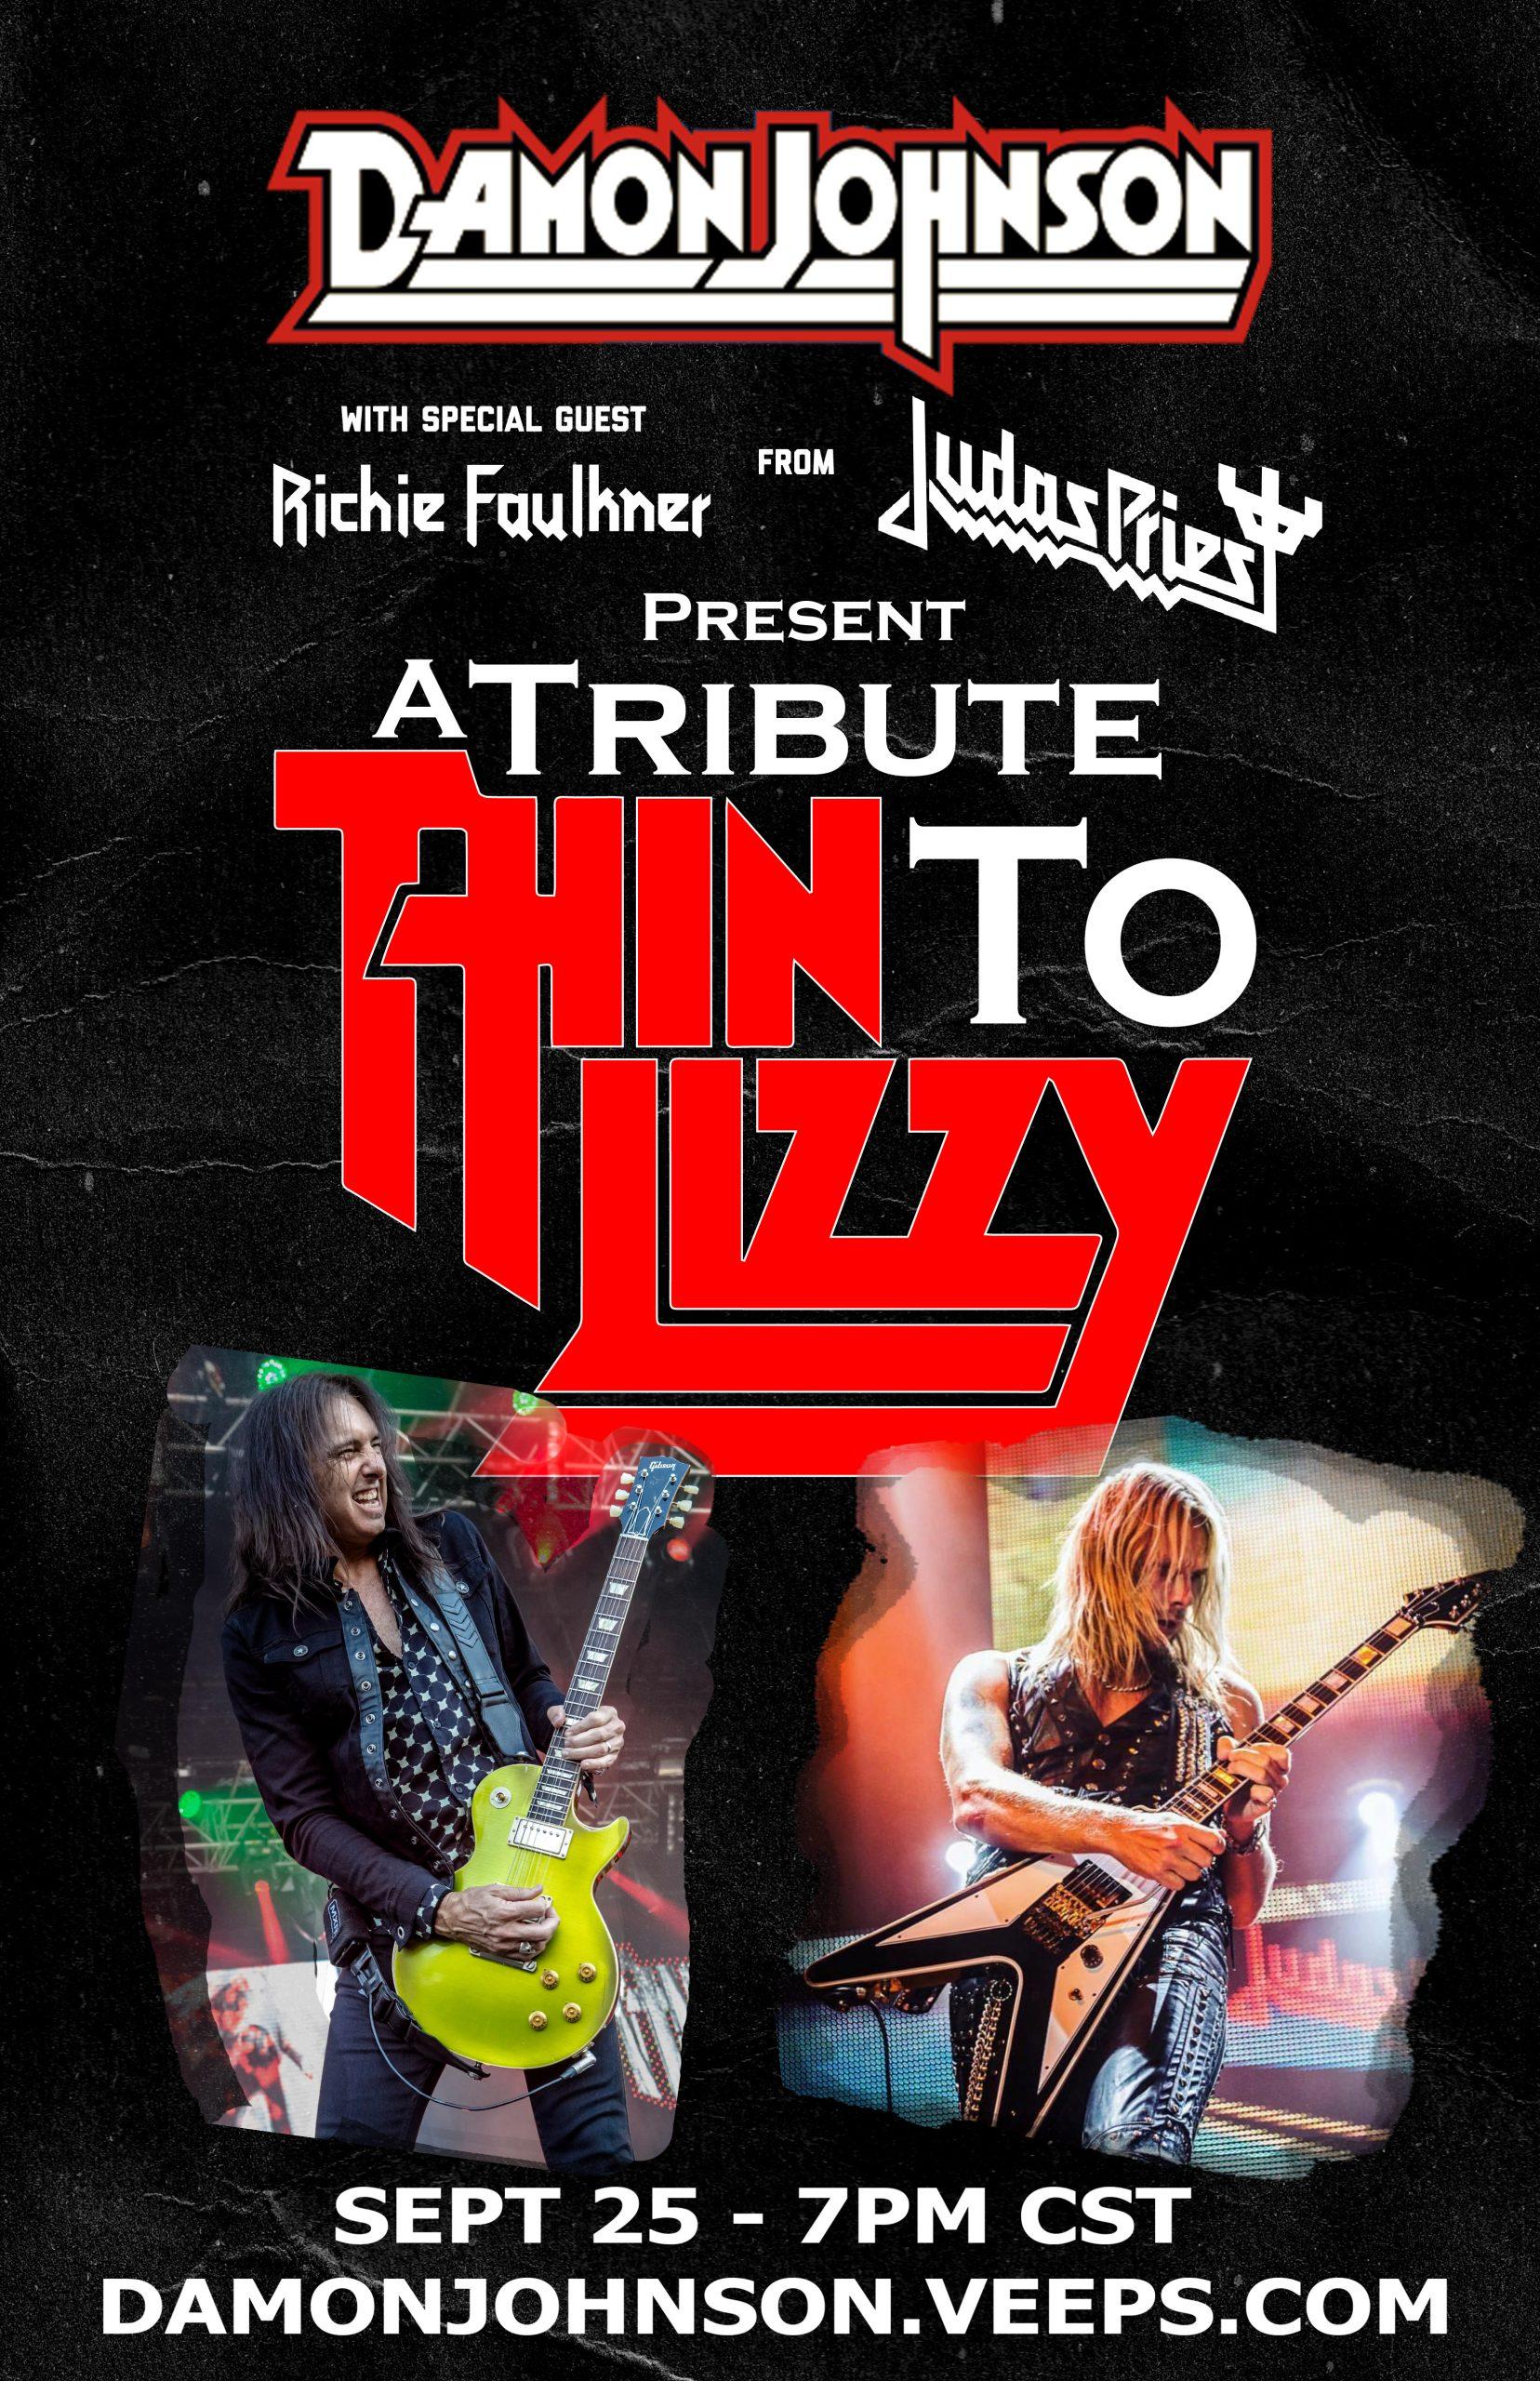 Damon Johnson Get Ready Richie Faulkner Battle Lessons New Album January 15 2020 Thin Lizzy